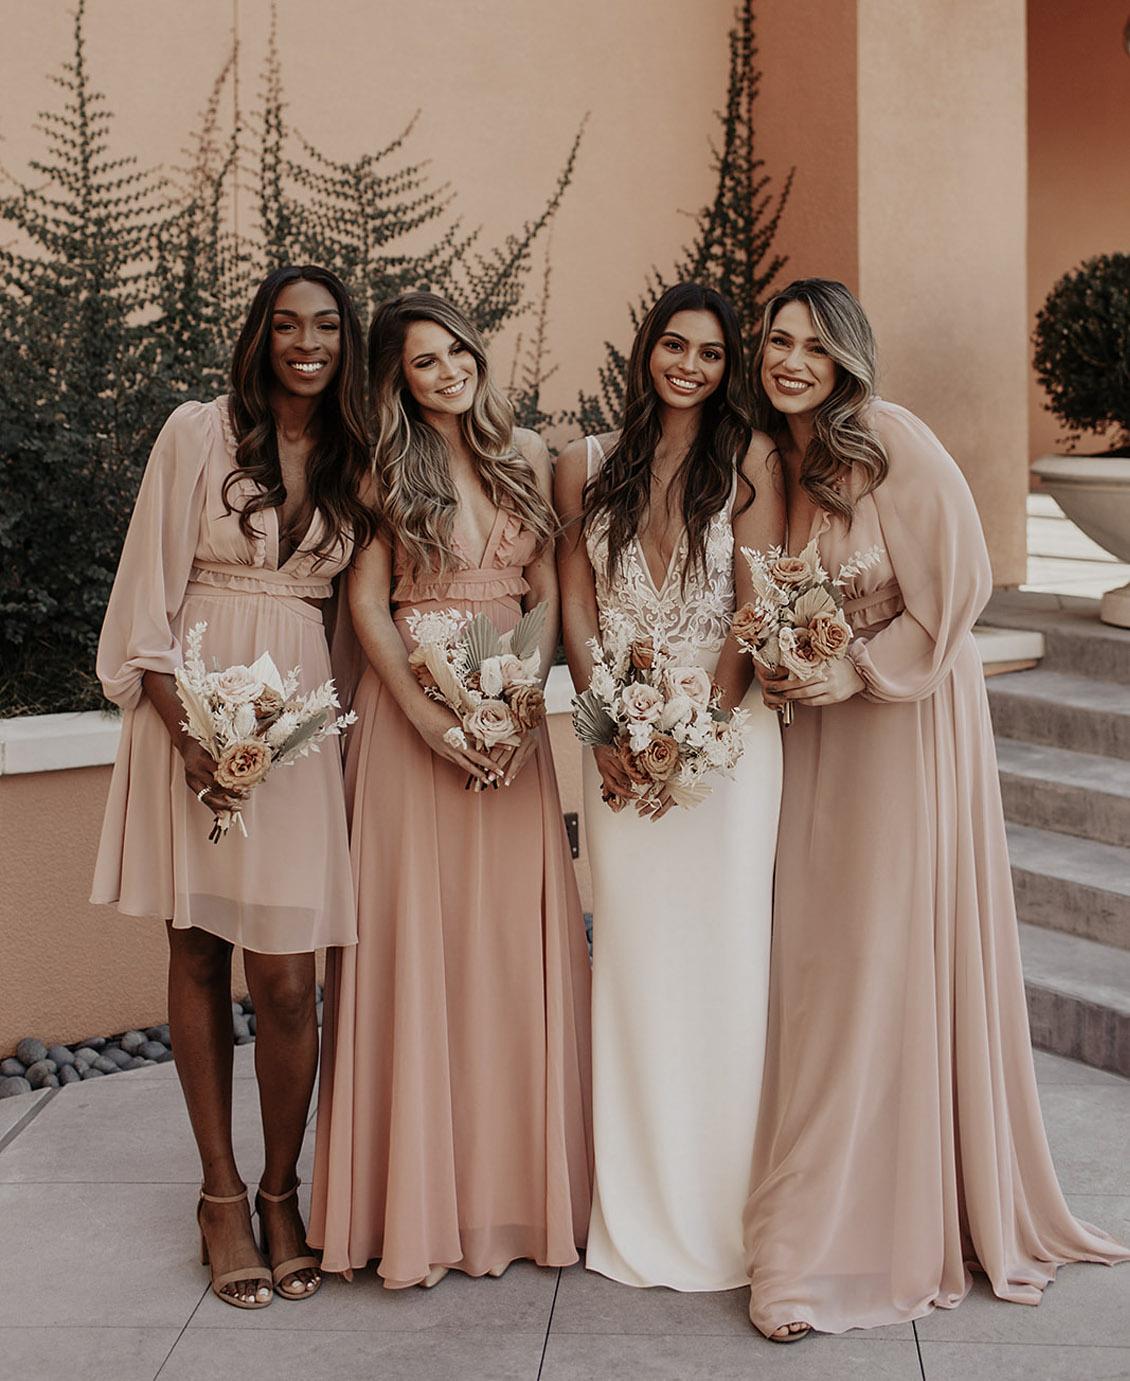 lovely bridesmaids dresses